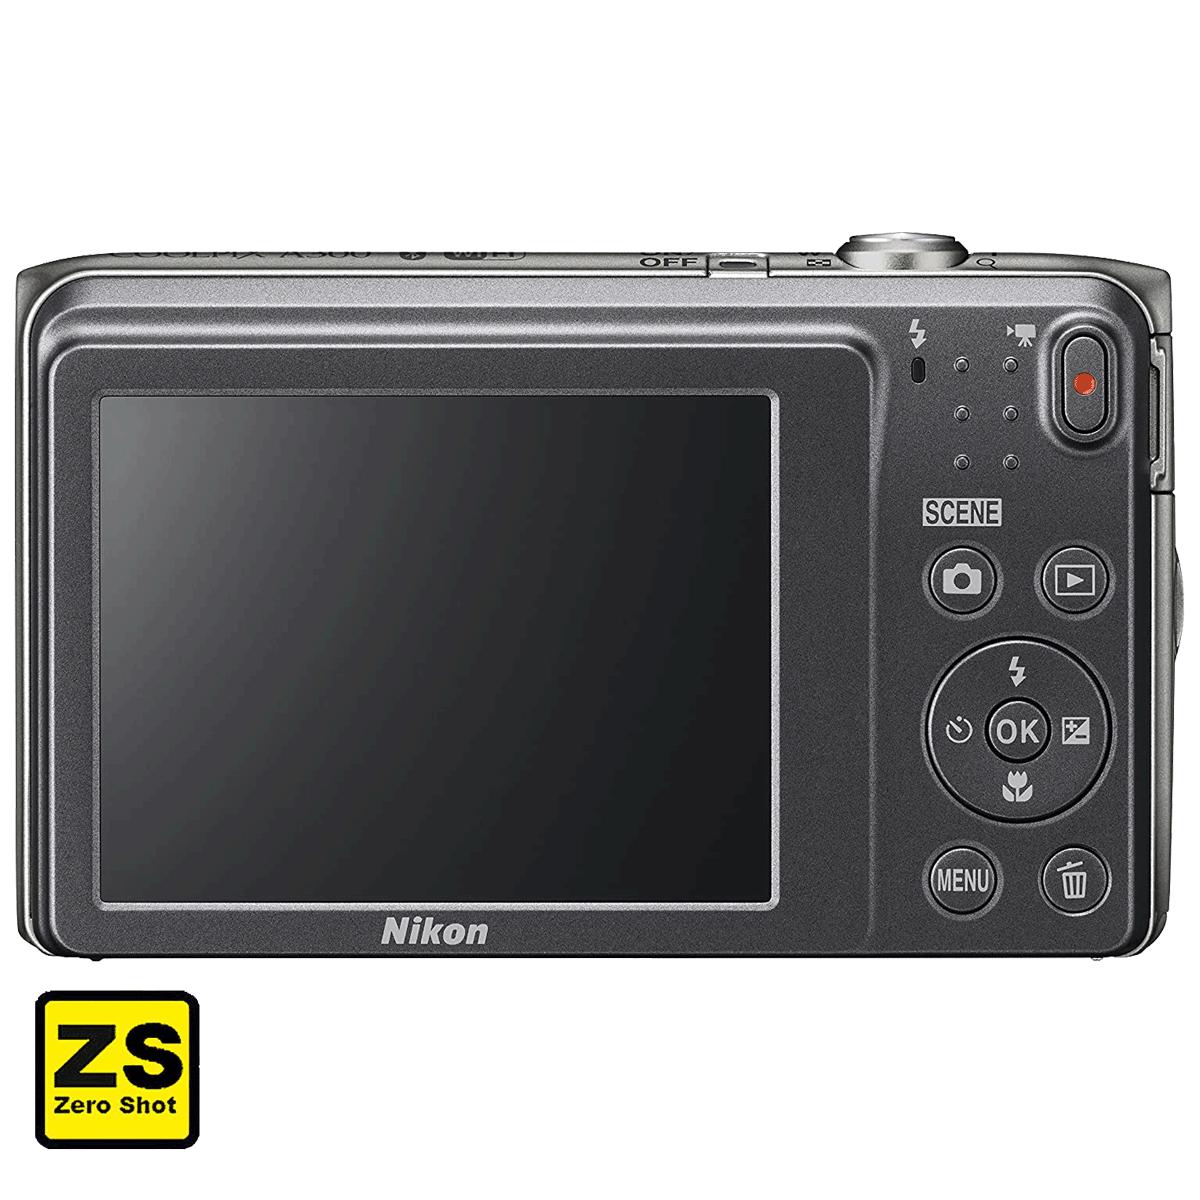 Câmera Nikon COOLPIX A300 Silver (Zero Shots)